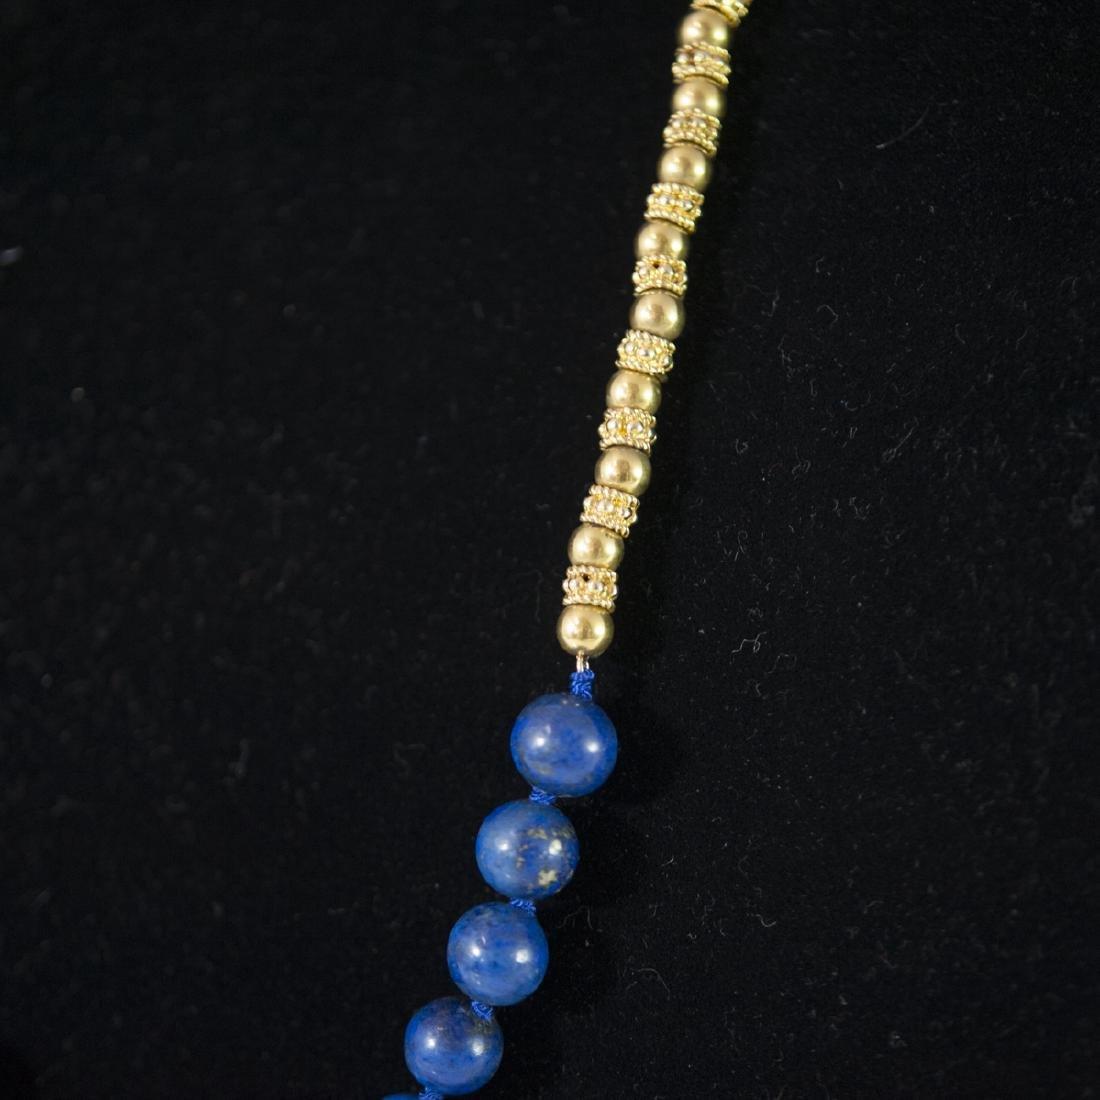 18kt Gold & Lapis Lazuli Necklace - 2